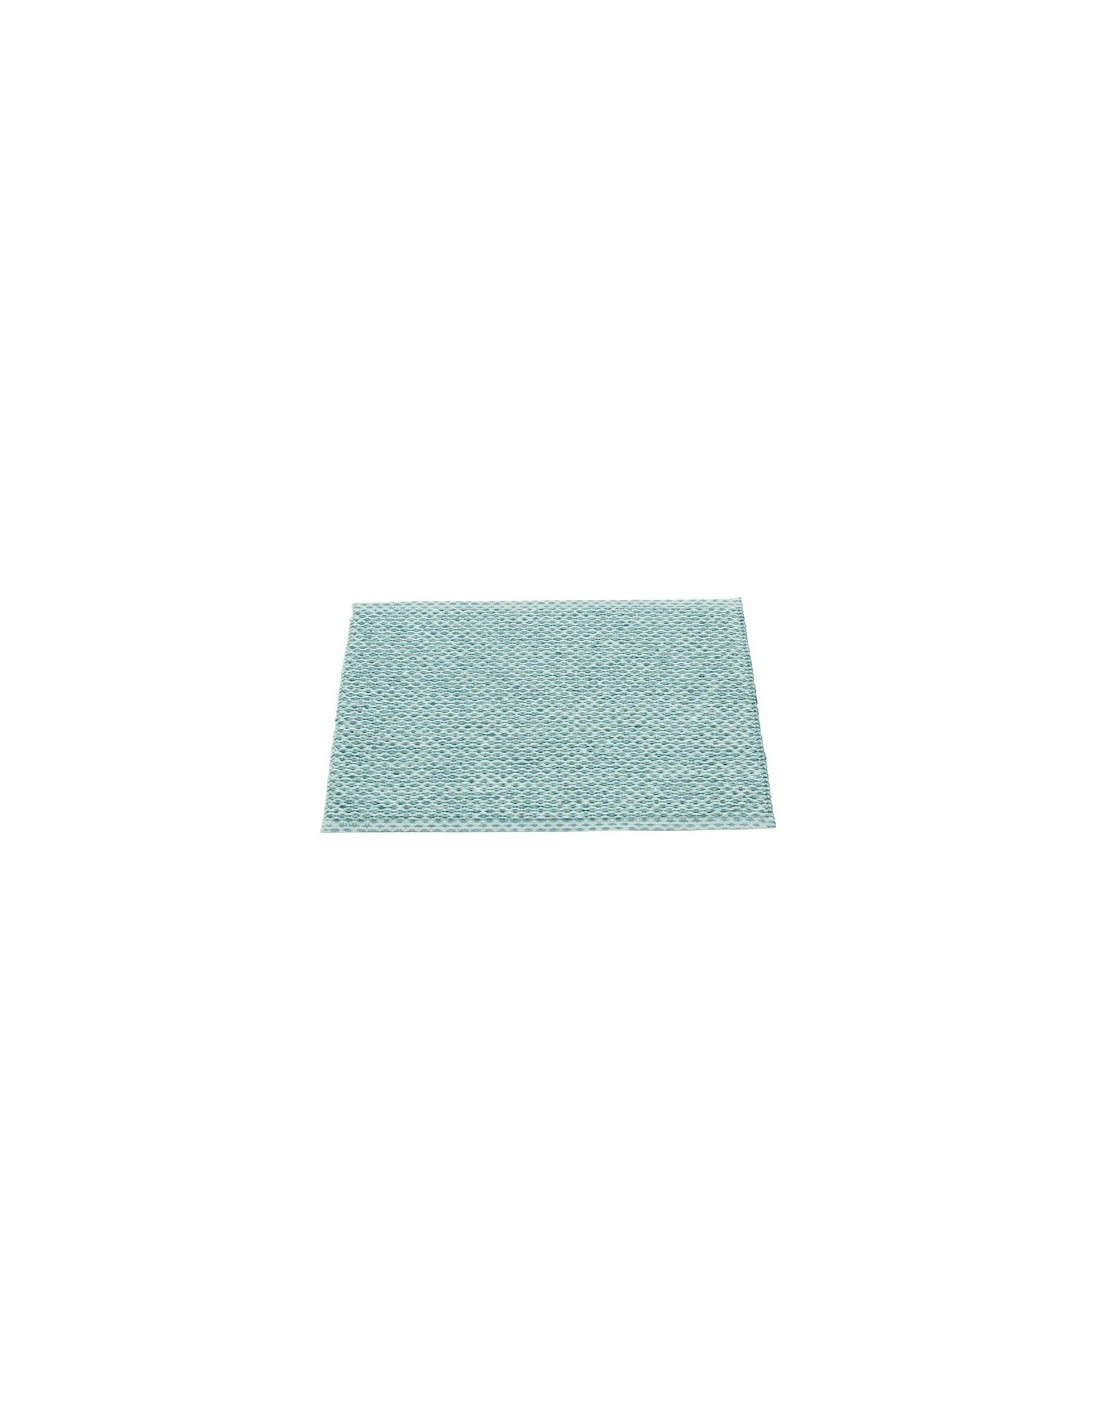 SVEA AZUR BLUE METALLIC 70/50 CM Thickness 5 mm